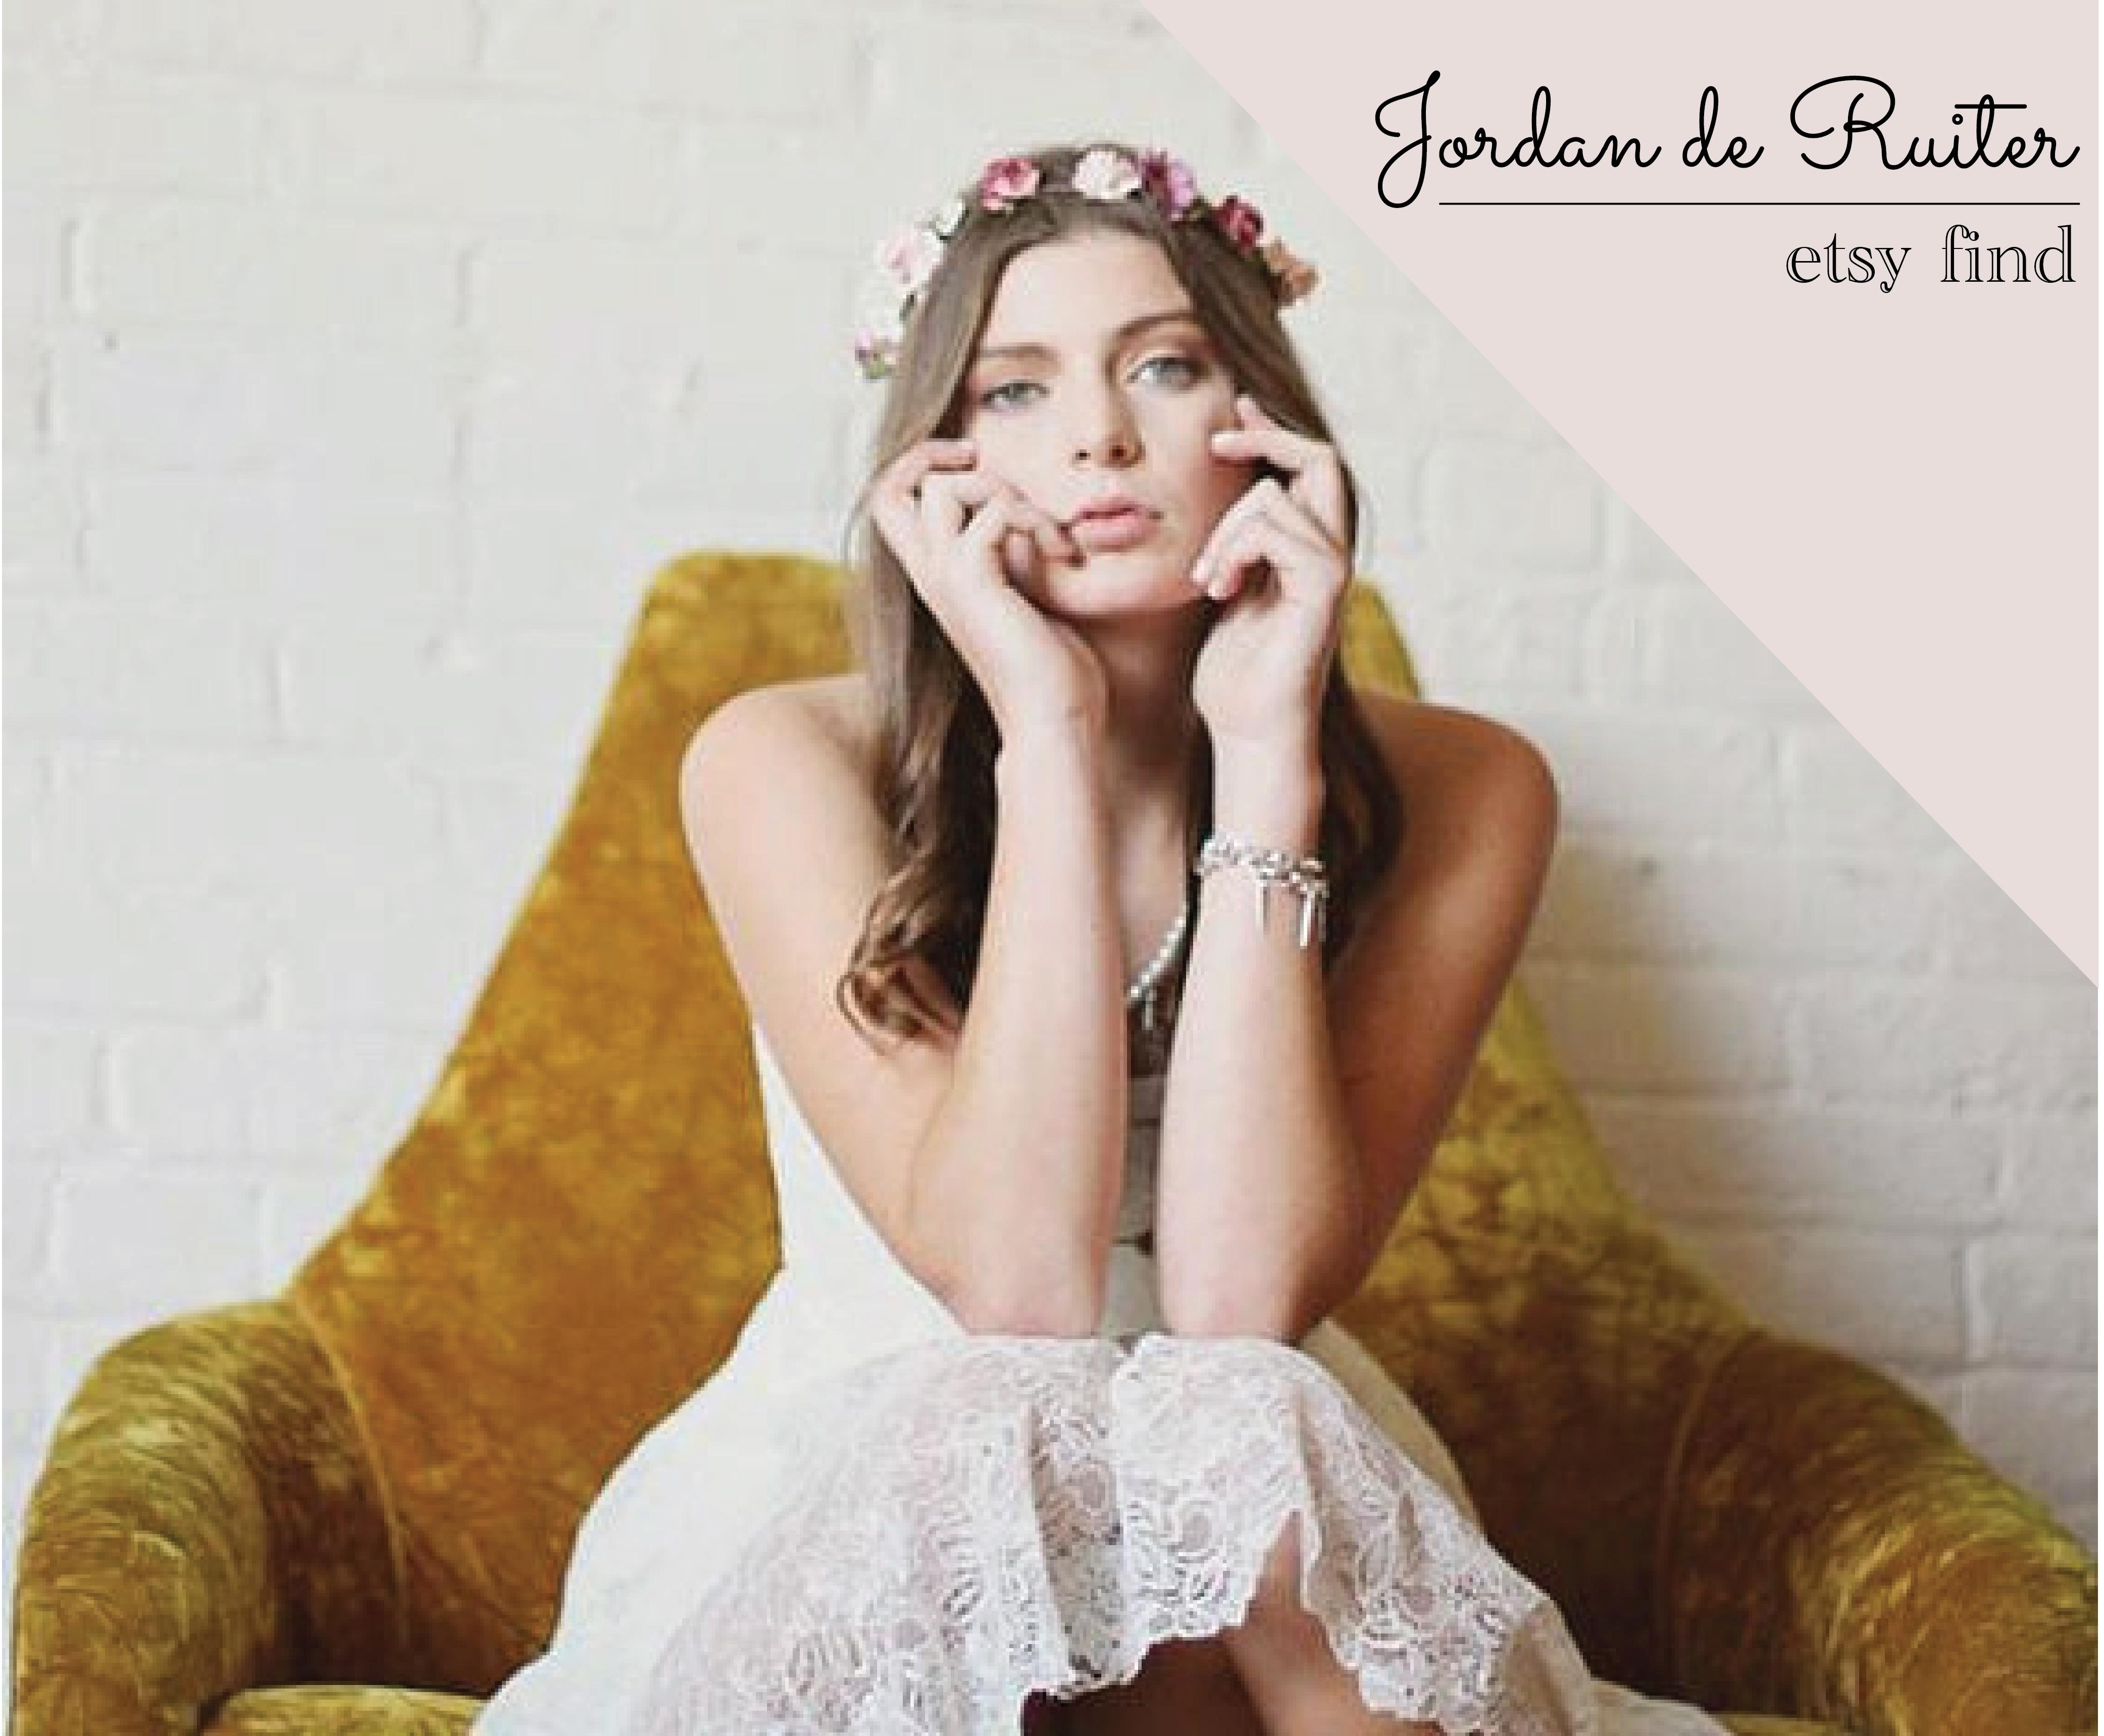 Etsy-Find-Jordan-de-Ruiter-01